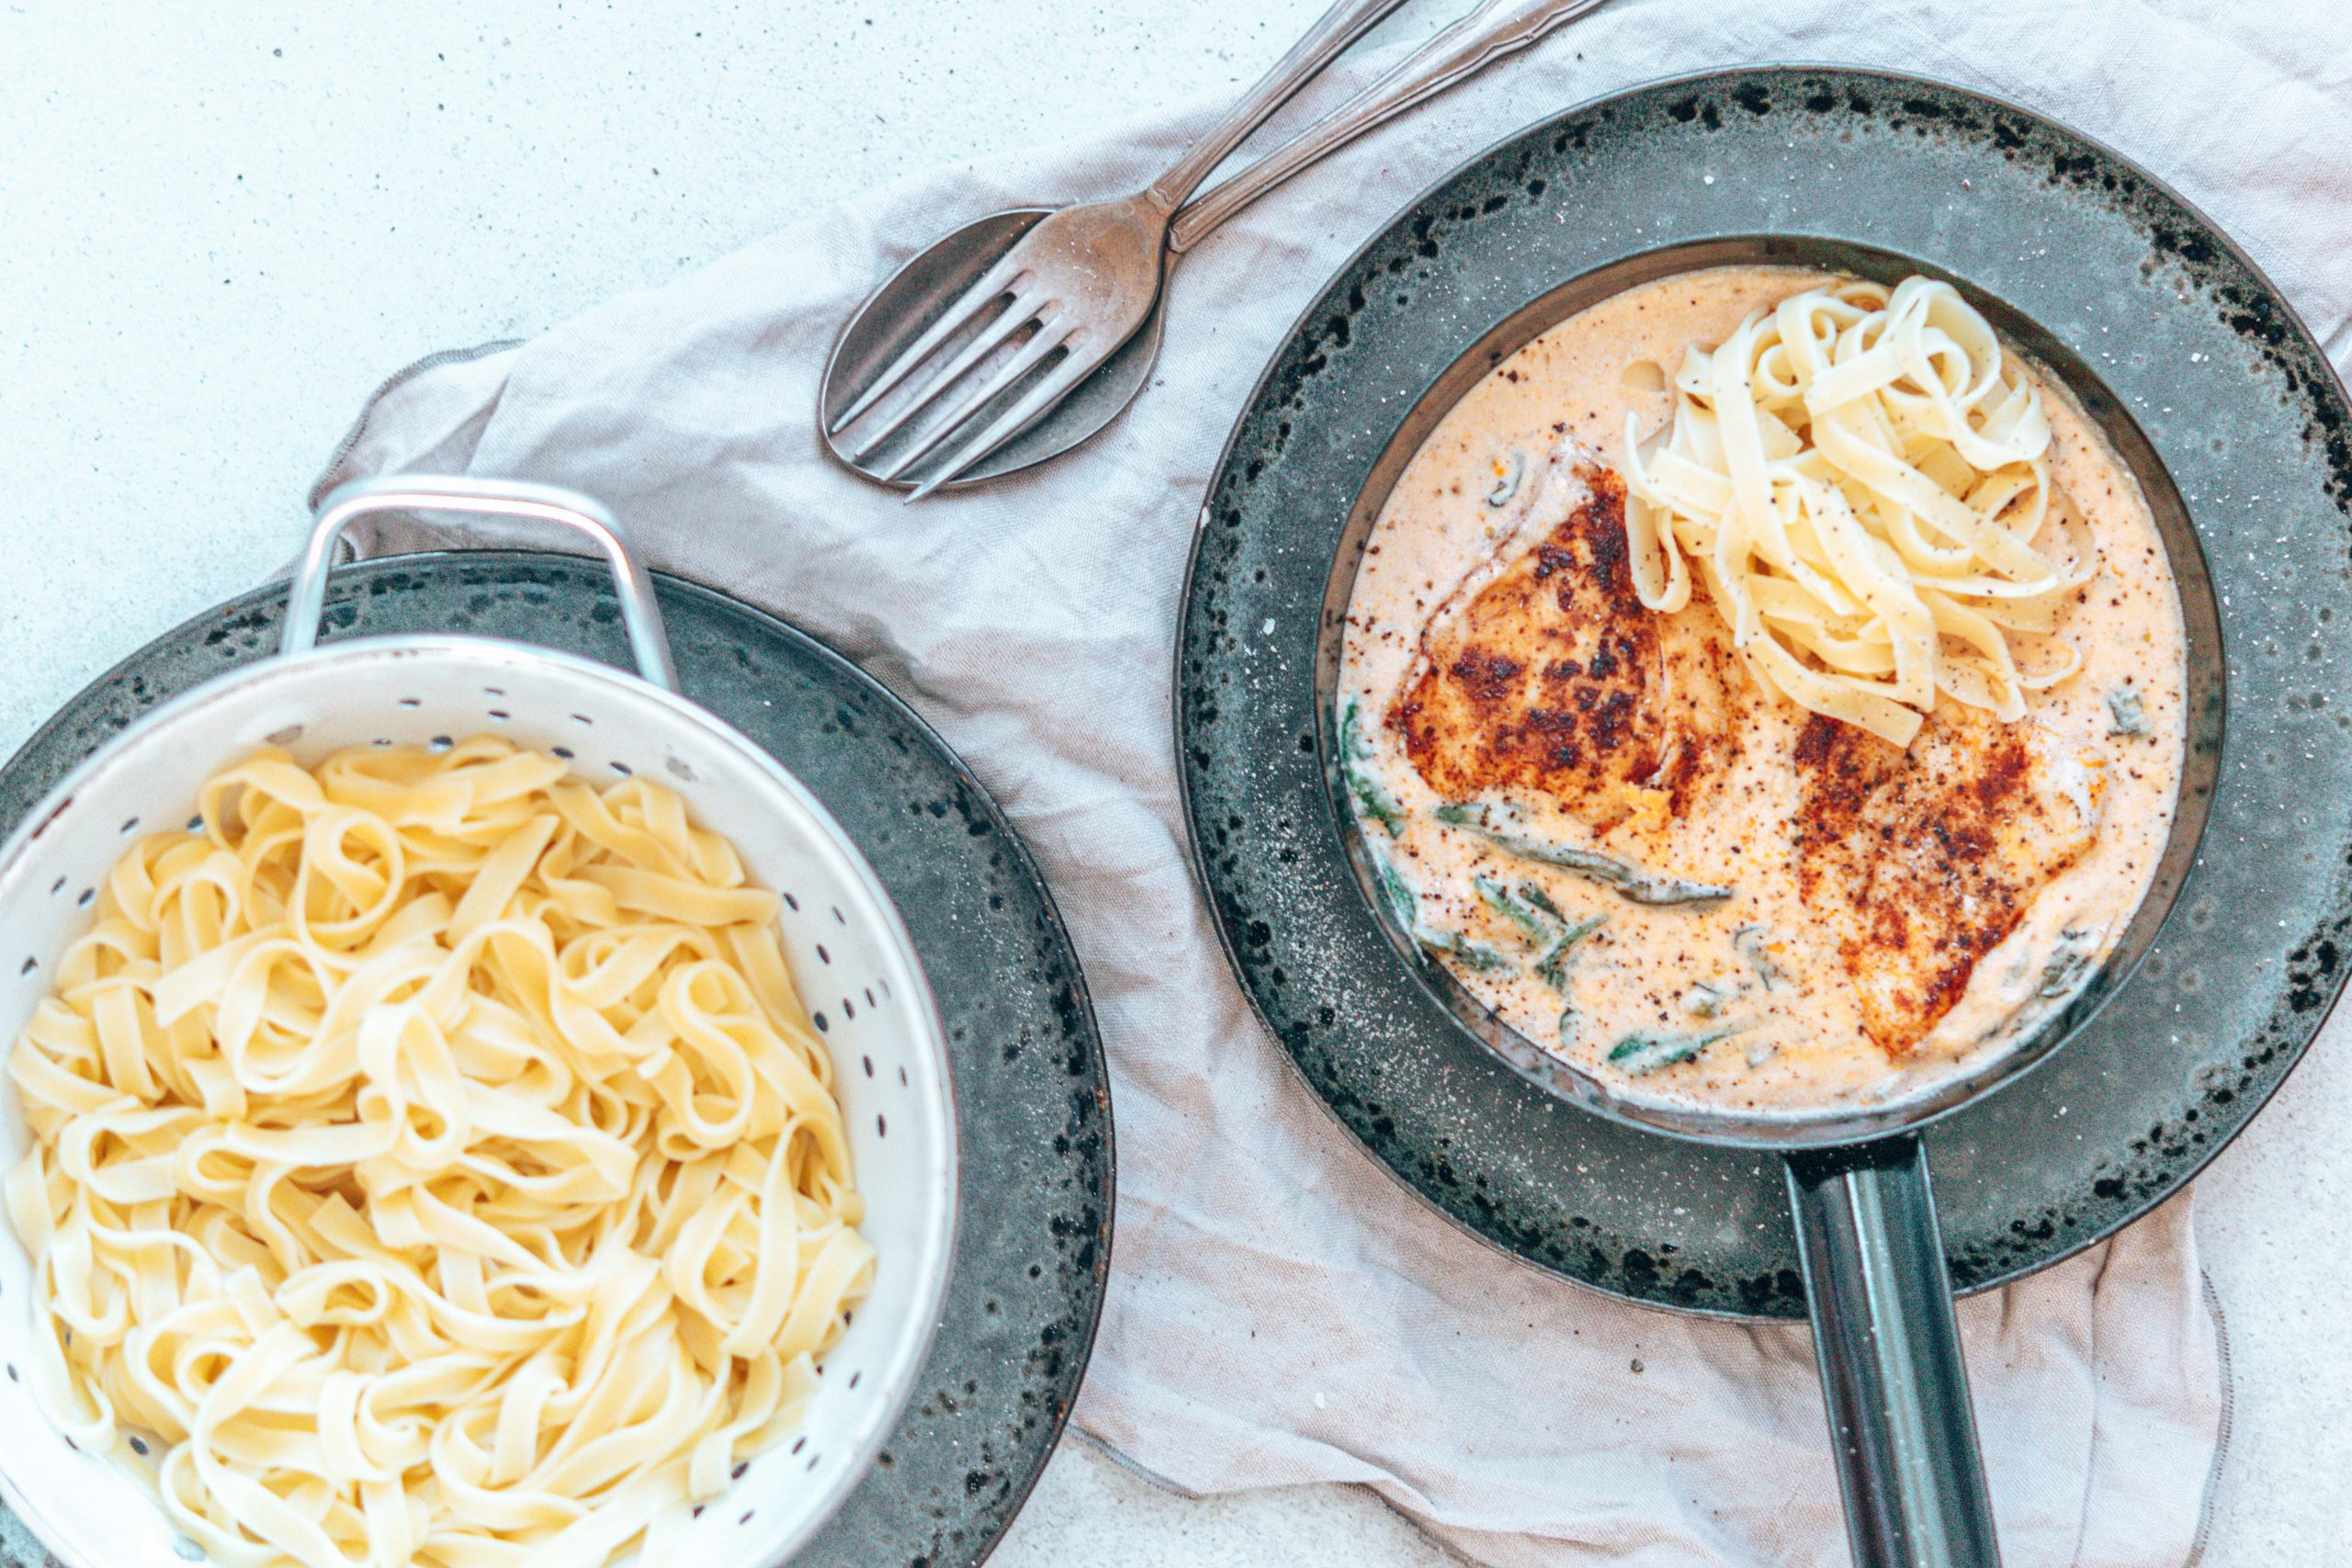 Hendl in Spinat-Frischkäse-Parmesan-Soße